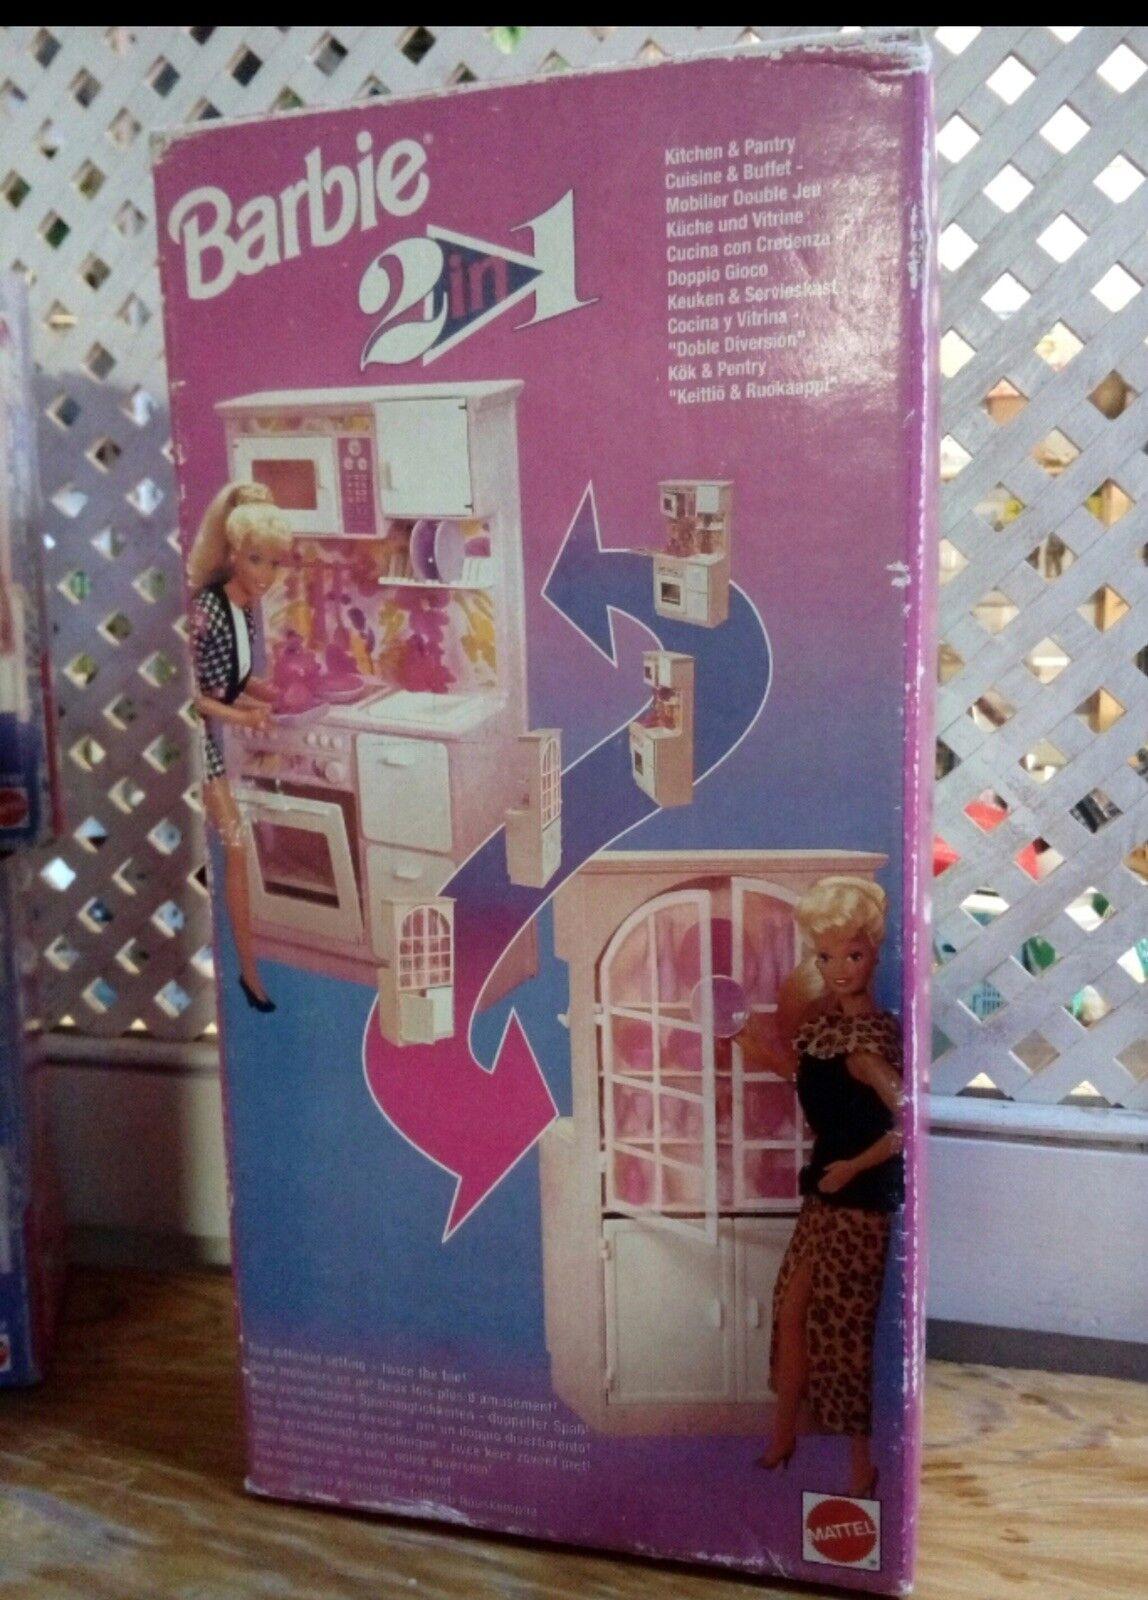 Barbie 2 in 1 Kitchen Cocina